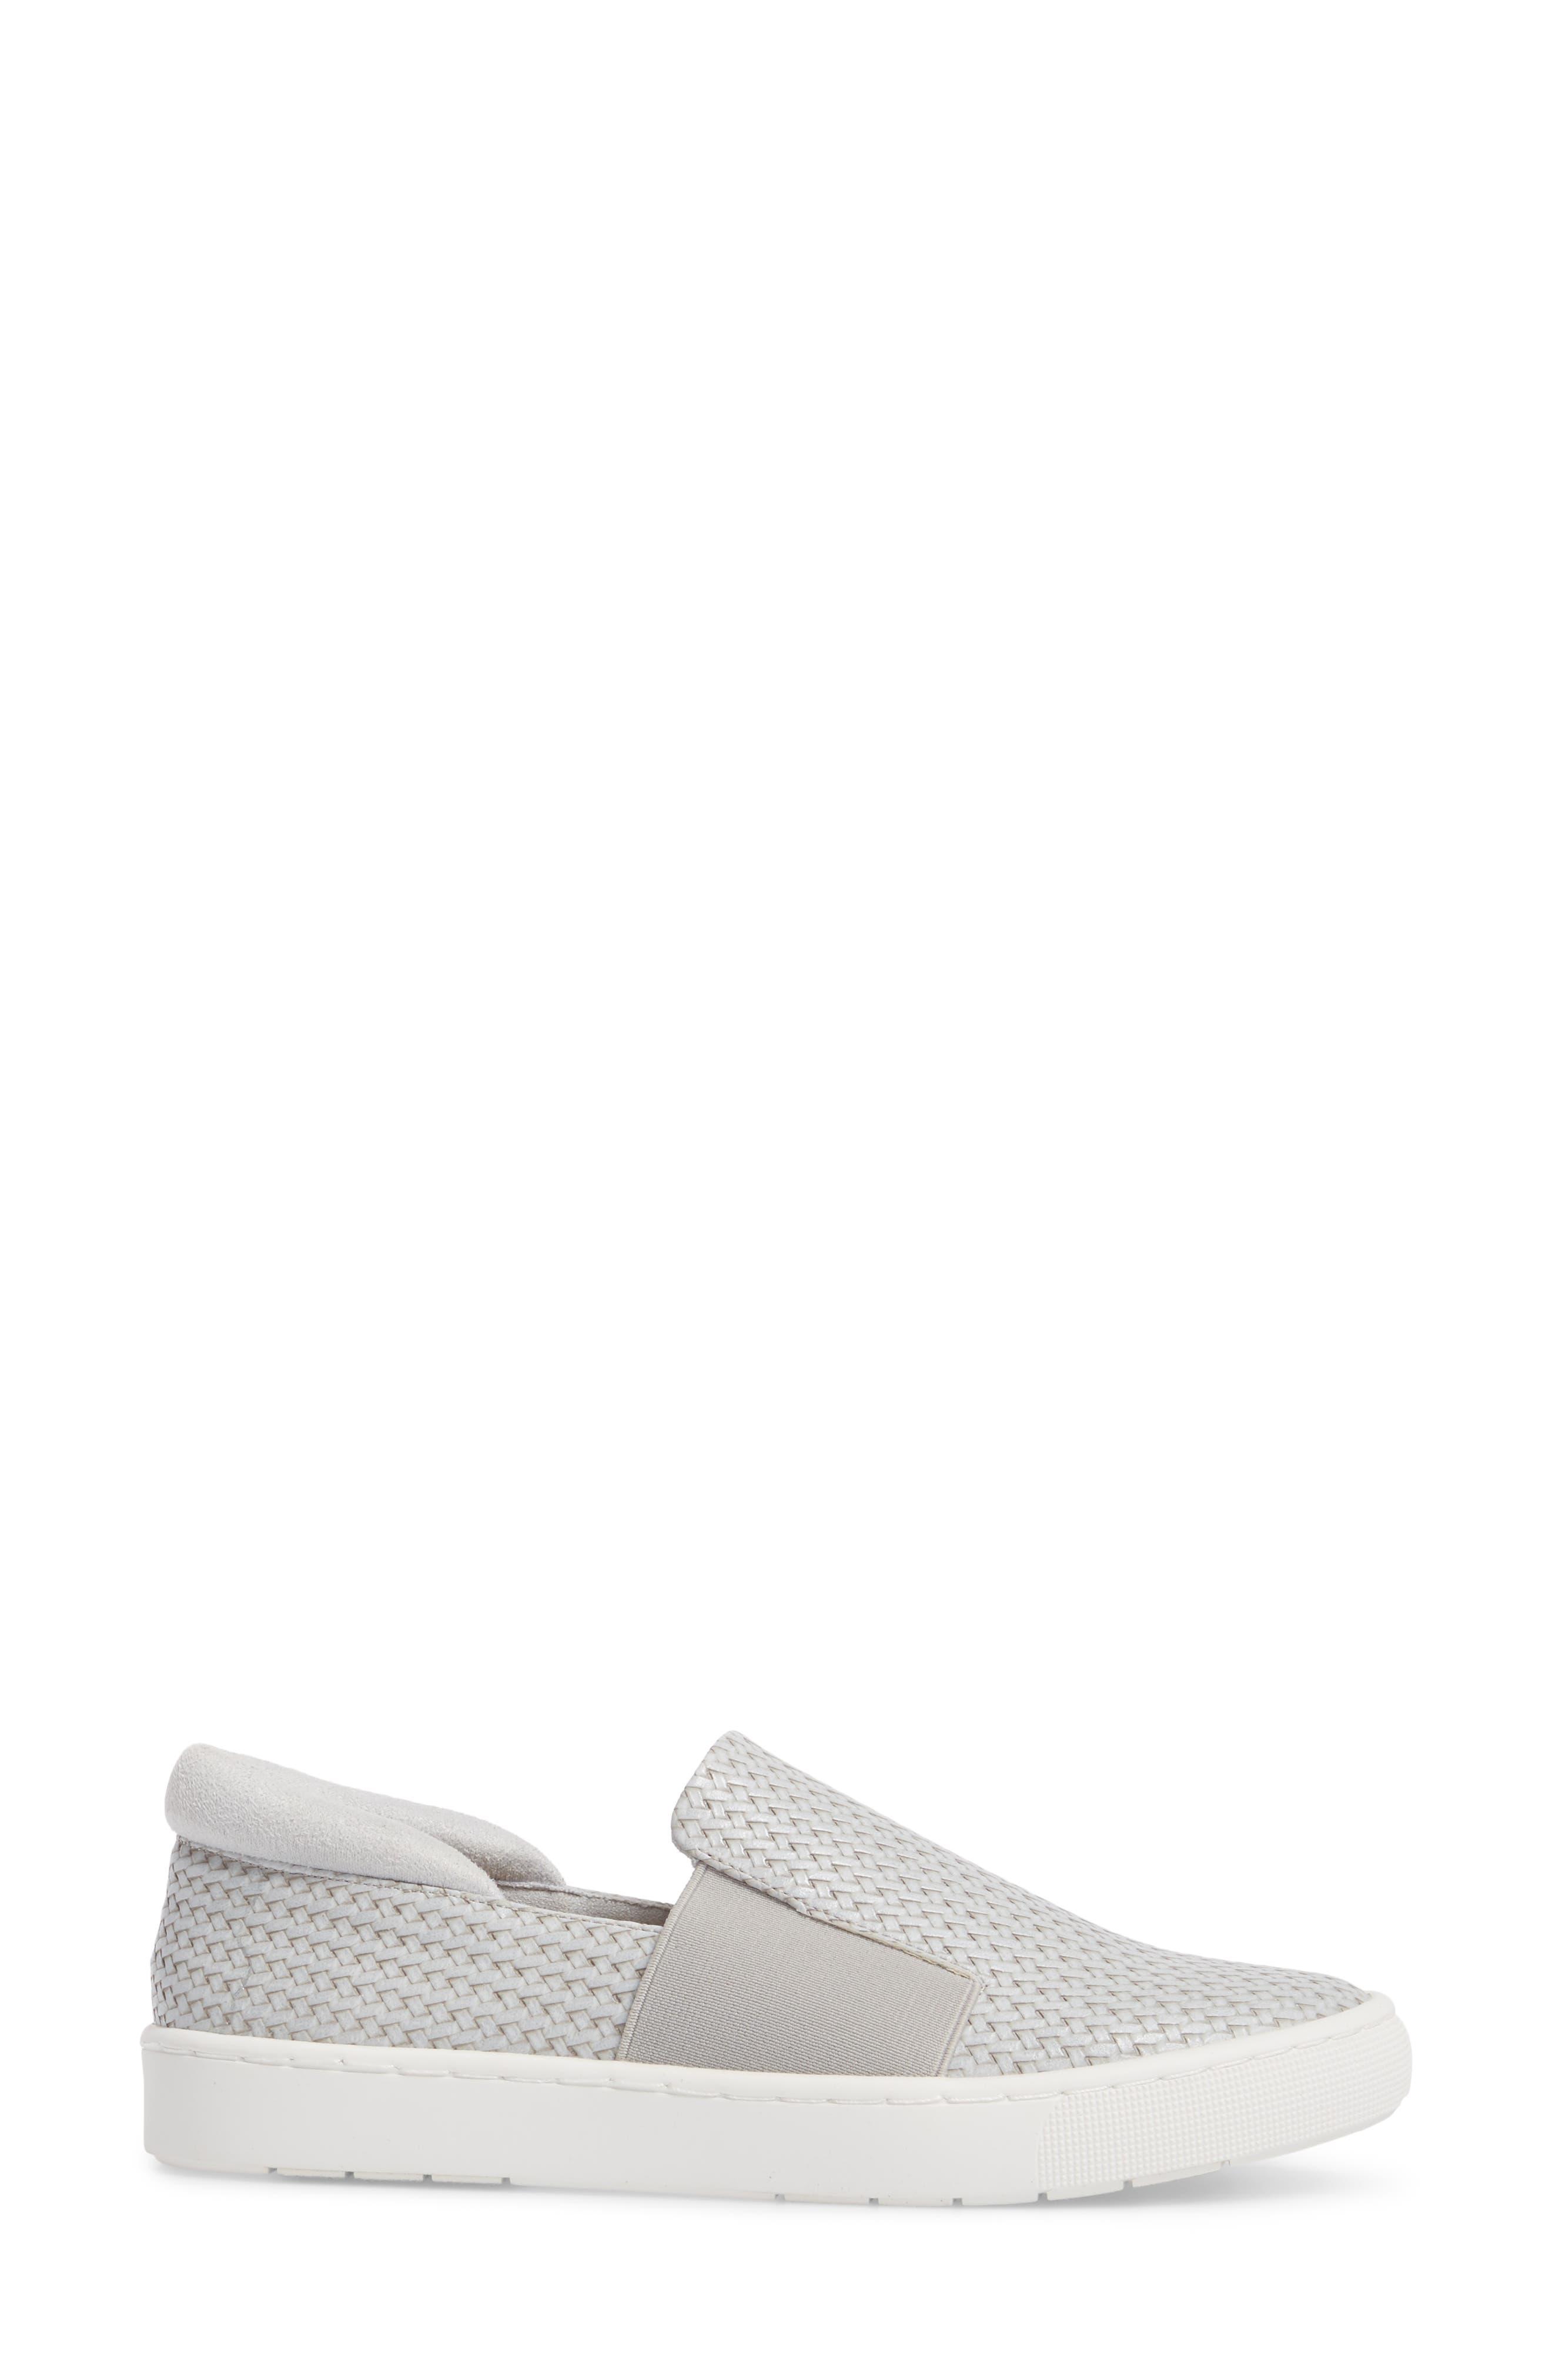 BELLA VITA, Ramp II Slip-On Sneaker, Alternate thumbnail 3, color, LIGHT GREY FABRIC